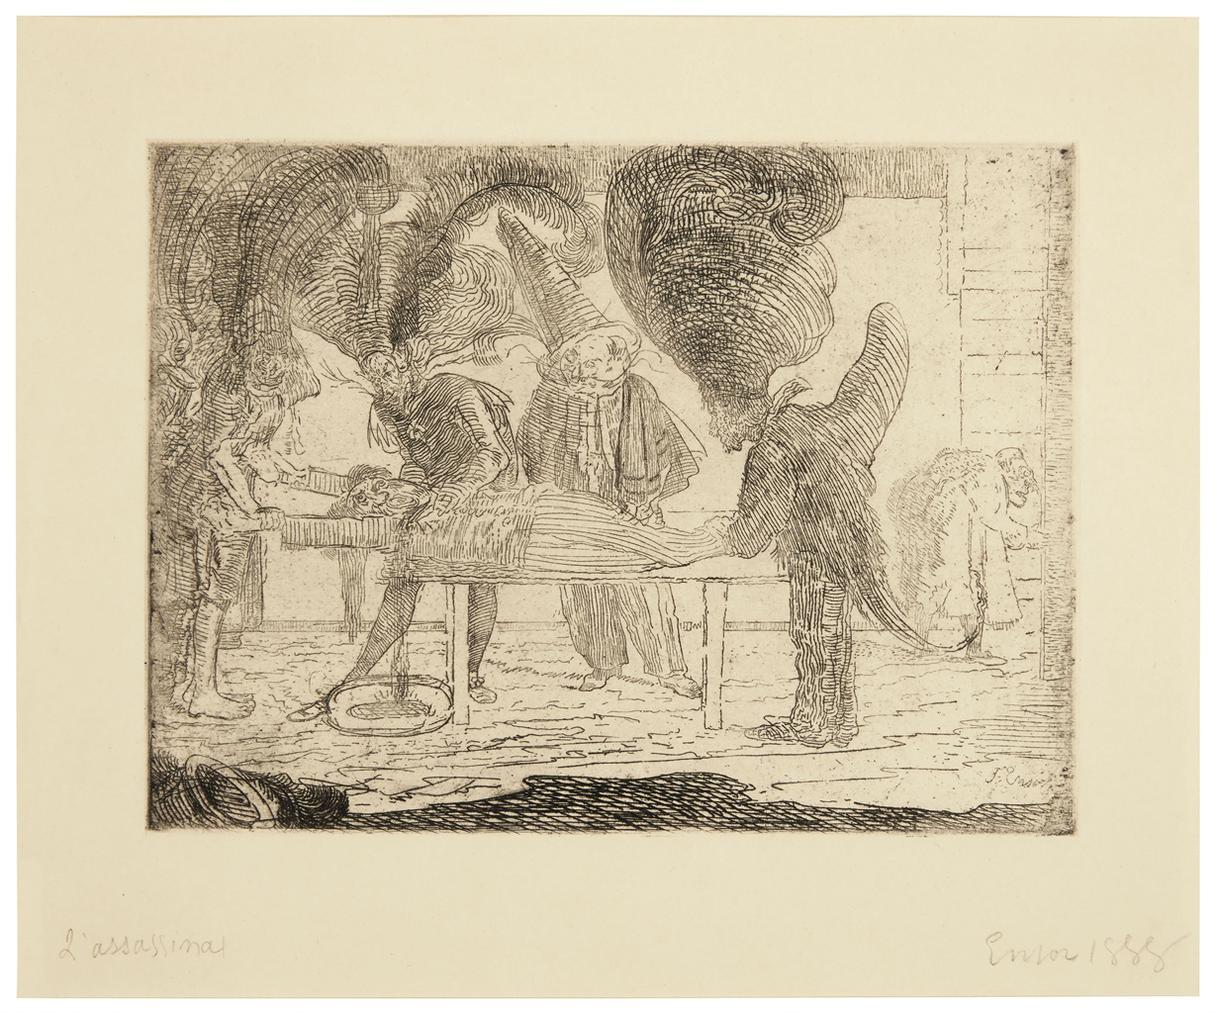 James Ensor-Lassassinat (The Assassination)-1888